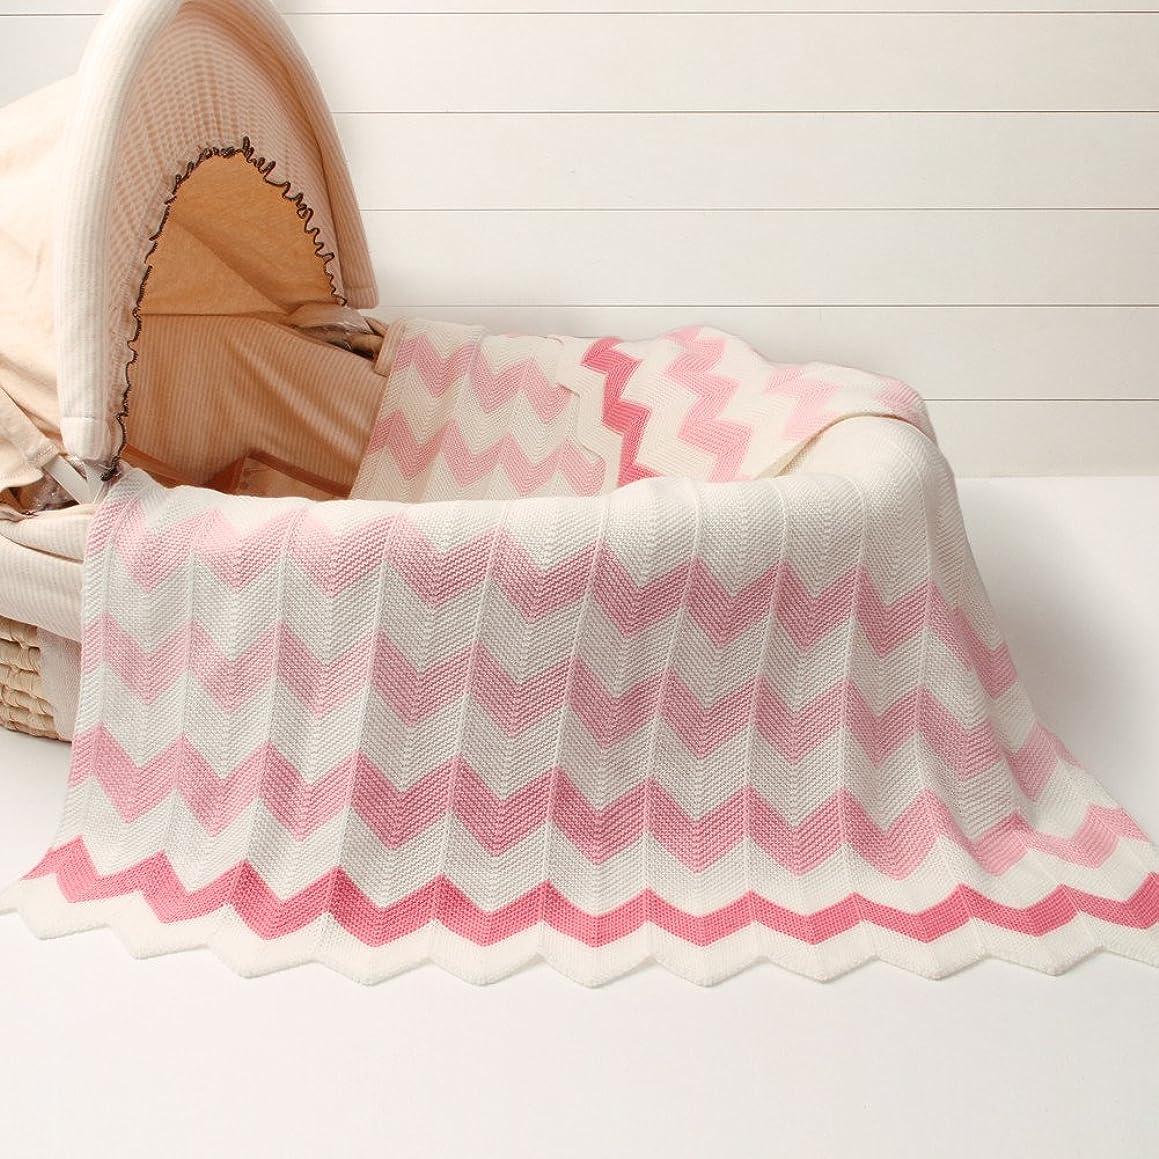 "Luerme Baby Knitted Blanket Throws Newborn Crochet Quilt Receiving Blanket Swaddle Wrap Stroller Cover Nursing Blanket Crib Rug Mat Print Blanket Warm Cuddle Sheet 30""X40"" (Pink)"